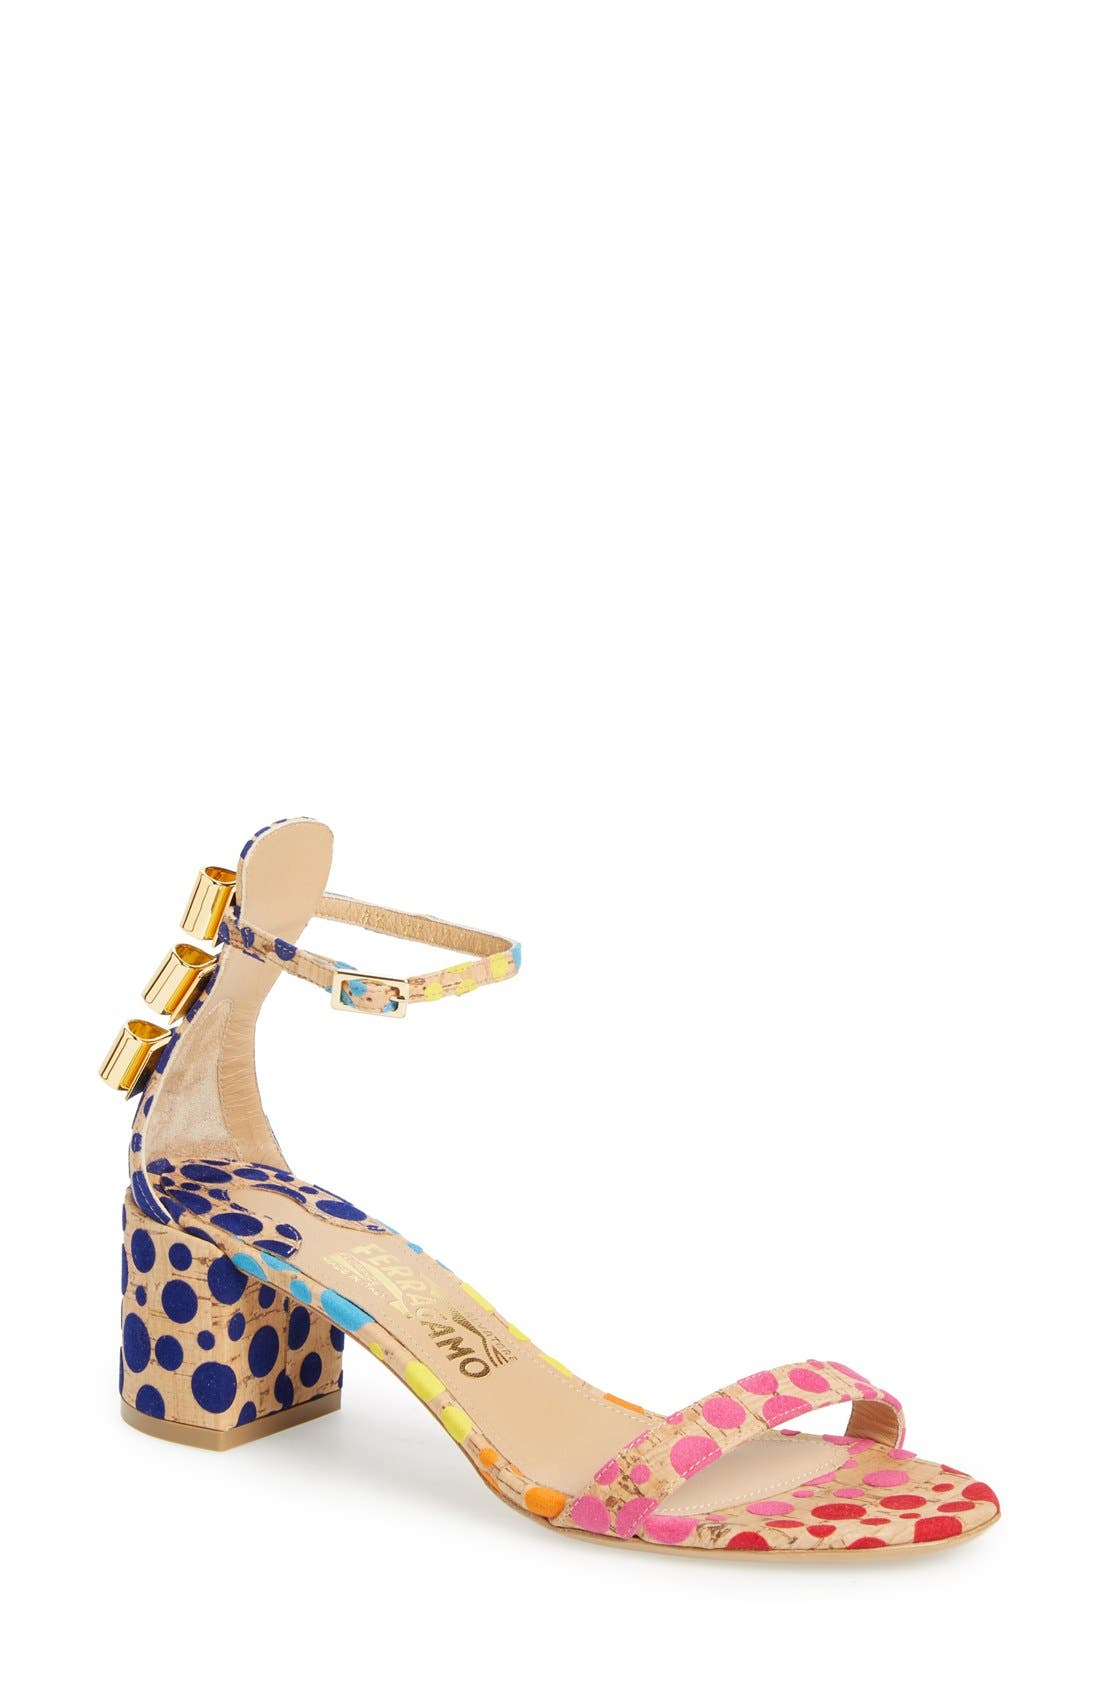 x Edgardo Osorio 'Connie' Ankle Strap Sandal,                             Main thumbnail 1, color,                             250